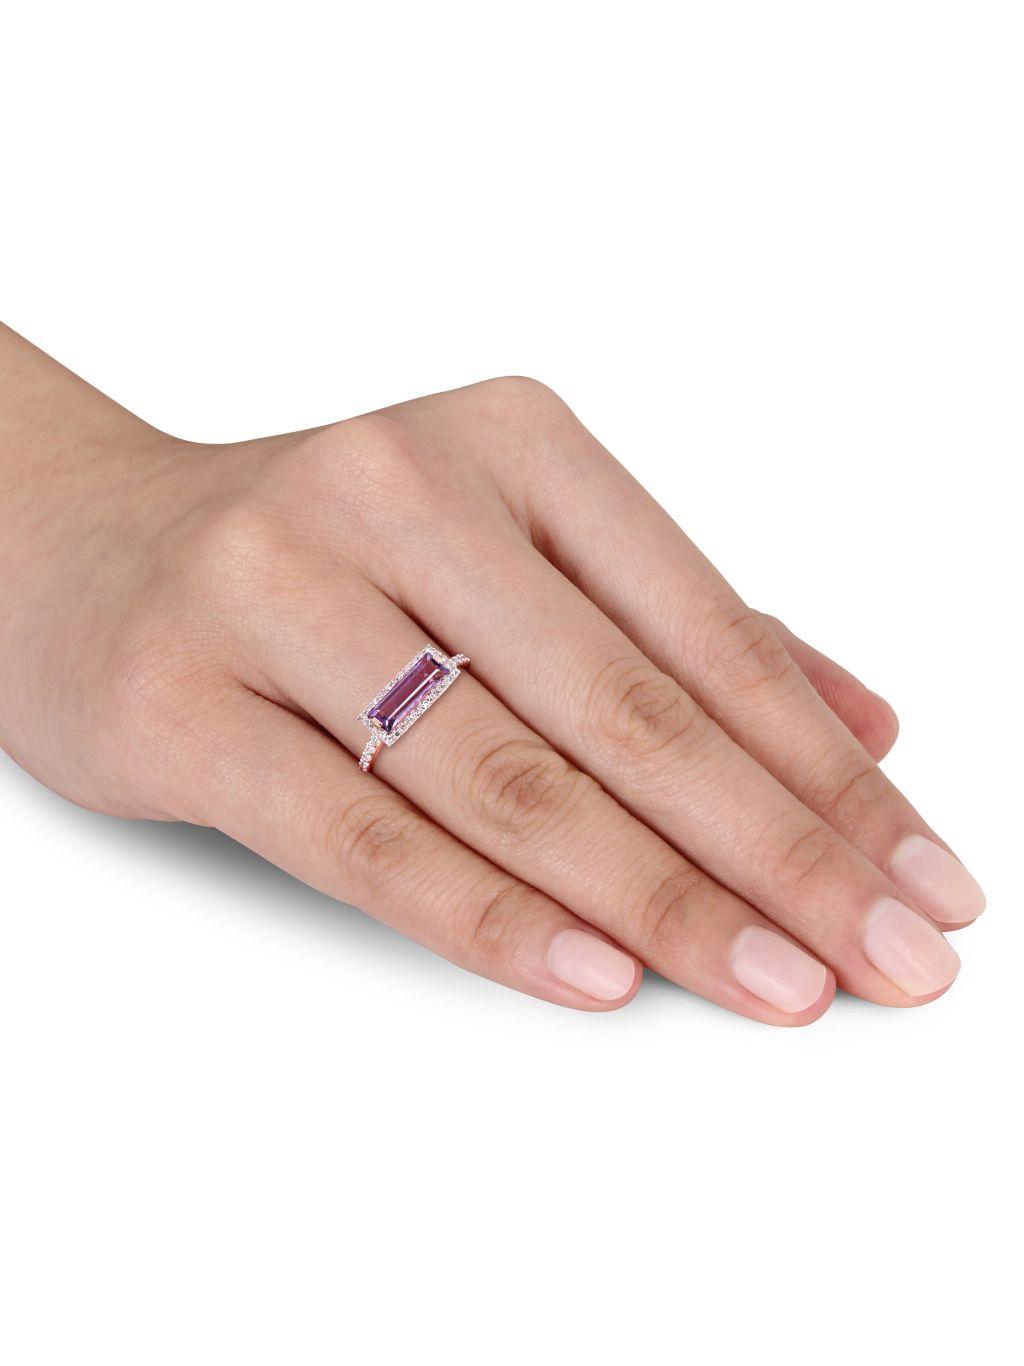 Saks Fifth Avenue 14K Rose Gold, Amethyst & Diamond Ring